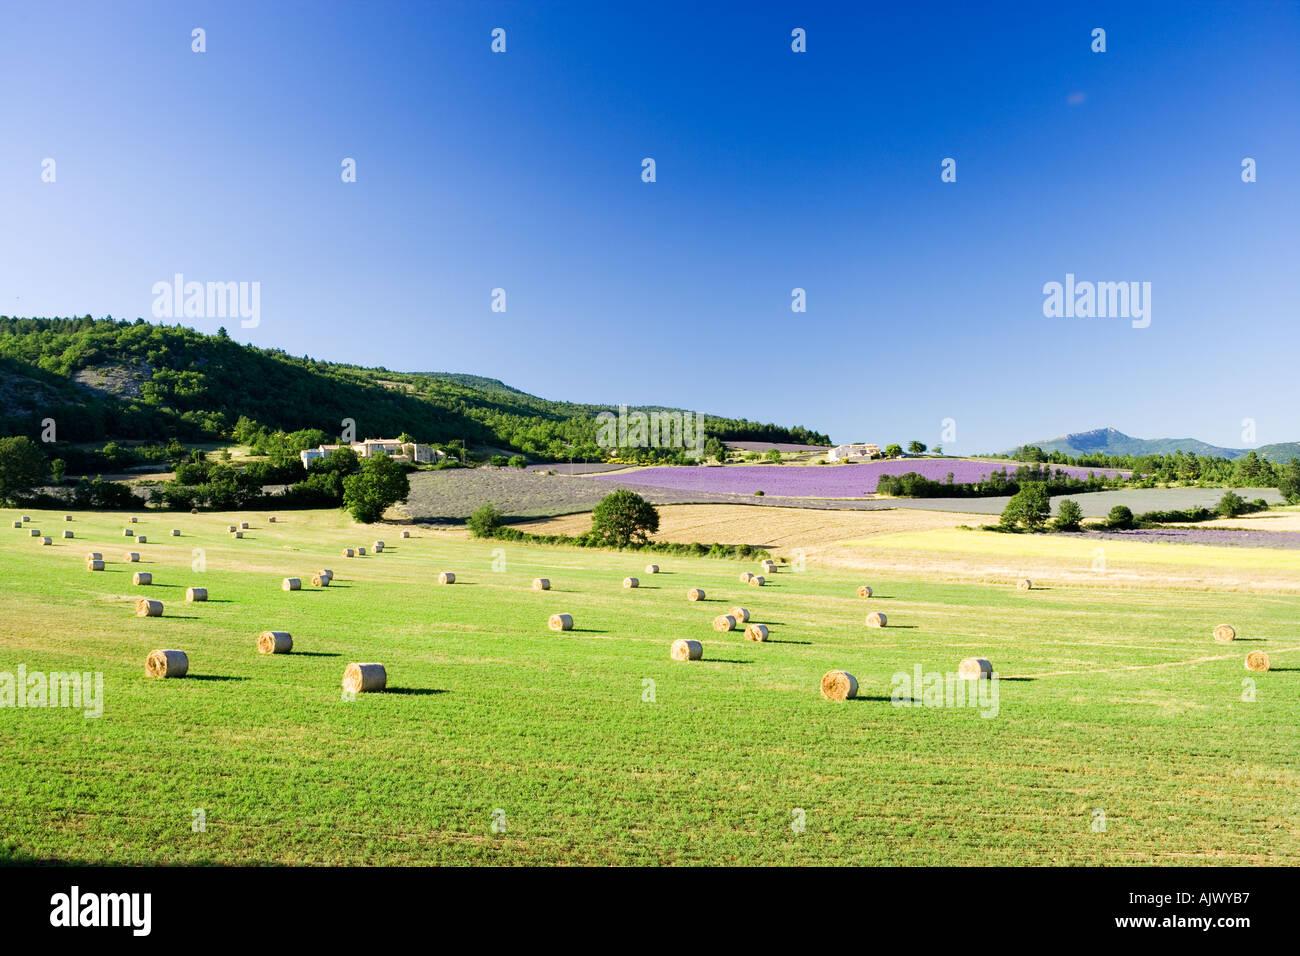 France Provence Vaucluse Region Rural scene with lavander fields - Stock Image